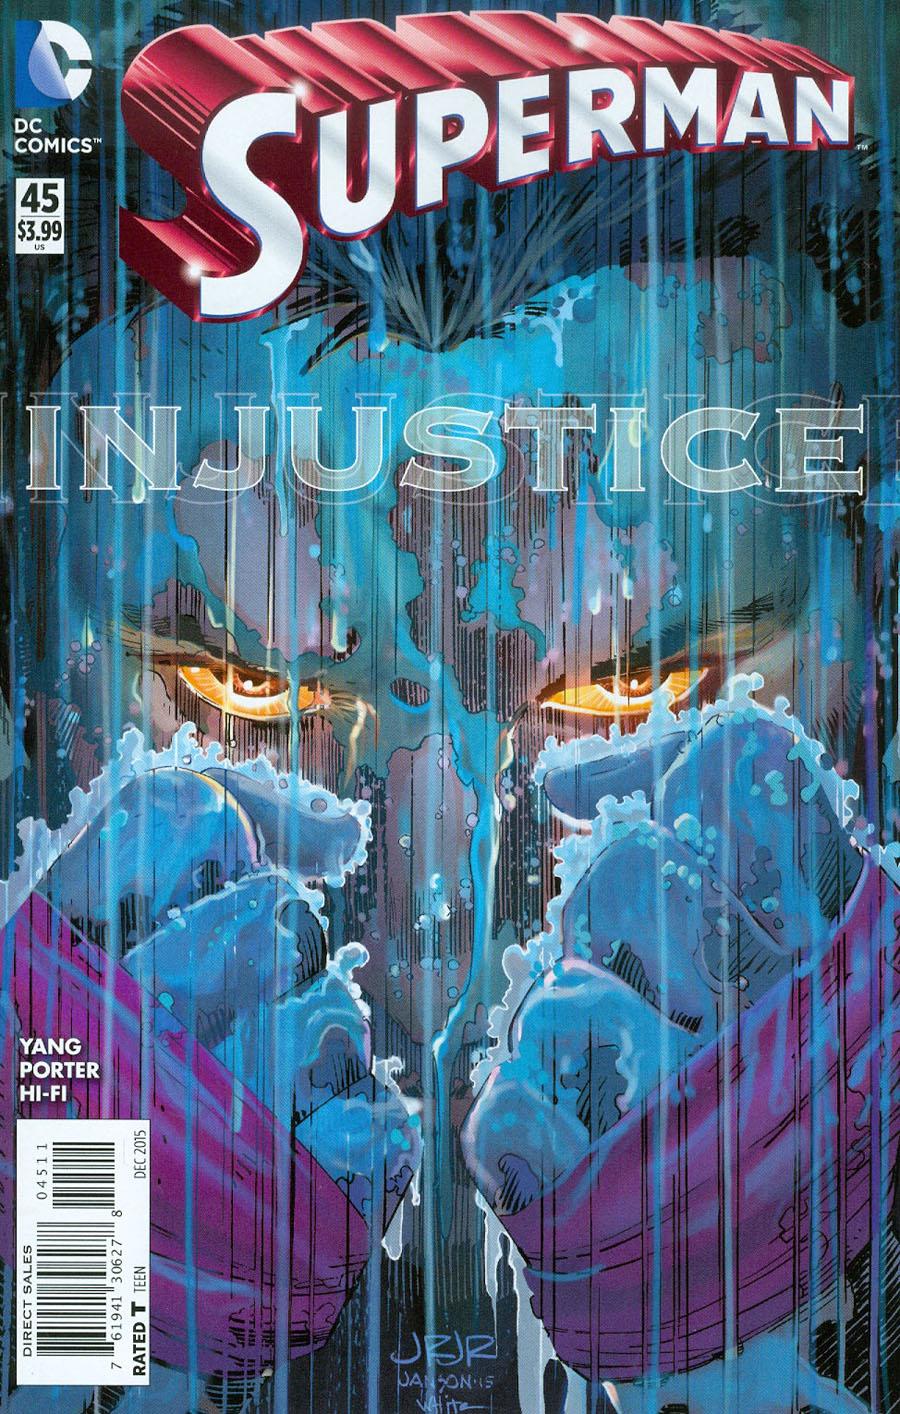 Superman Vol 4 #45 Cover A Regular John Romita Jr Cover